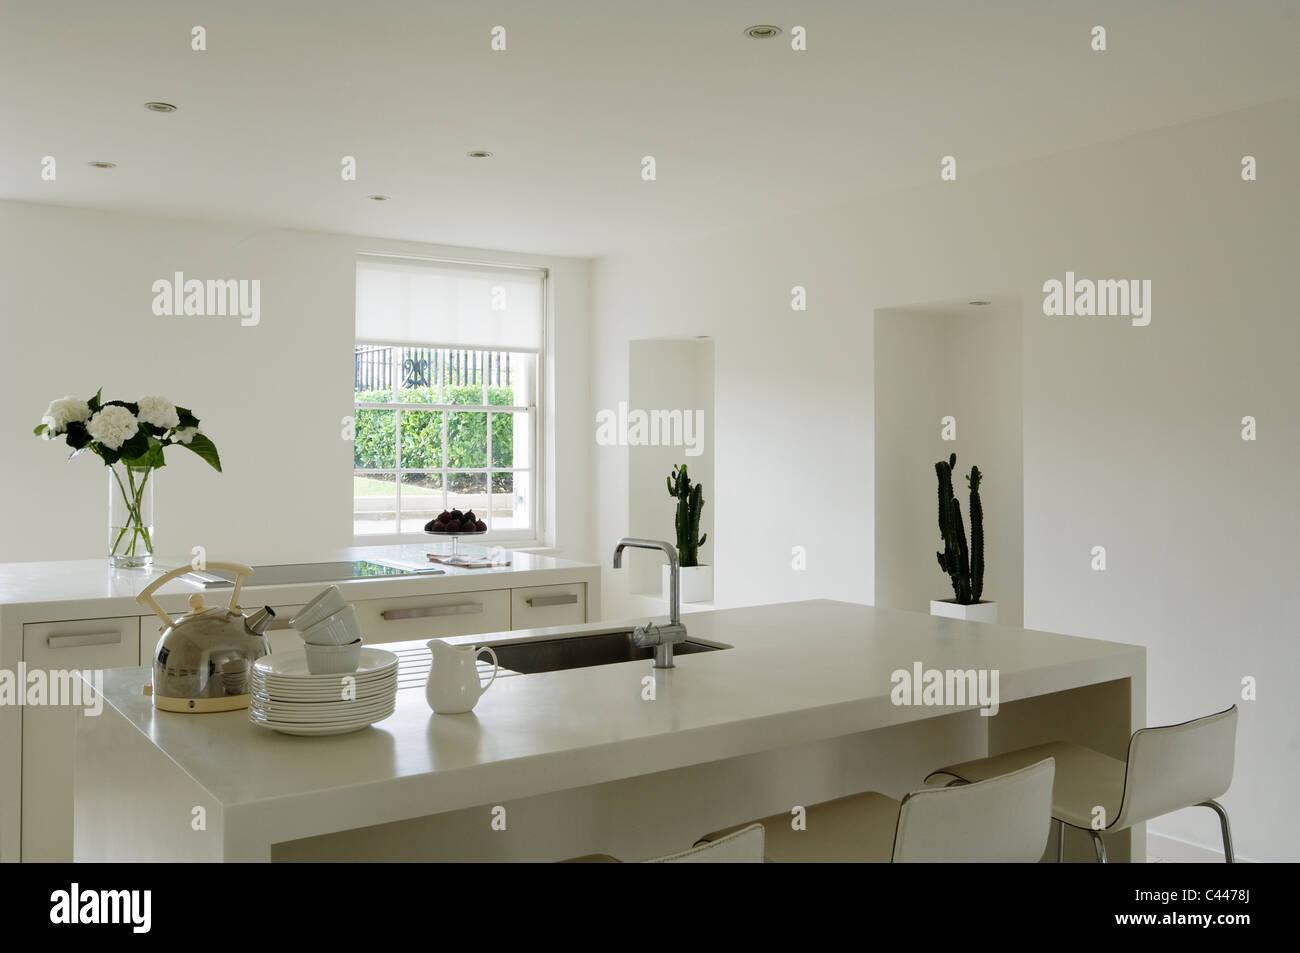 Kitchen Worktops Stock Photos & Kitchen Worktops Stock Images - Alamy